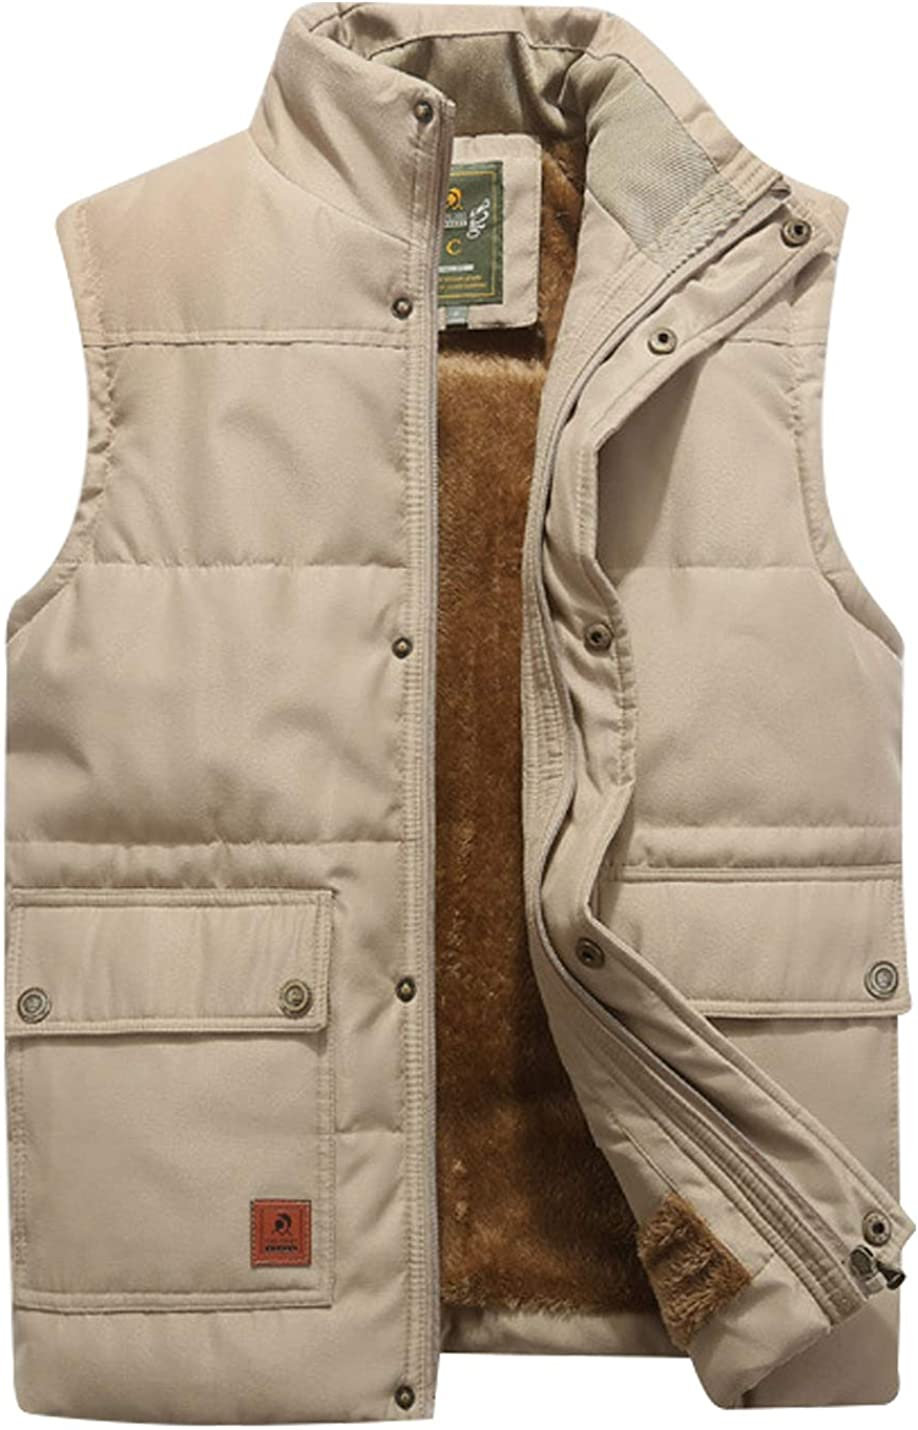 Omoone Men's High Collar Fleece Lined Gilet Warm Padded Jacket Vest Waistcoat